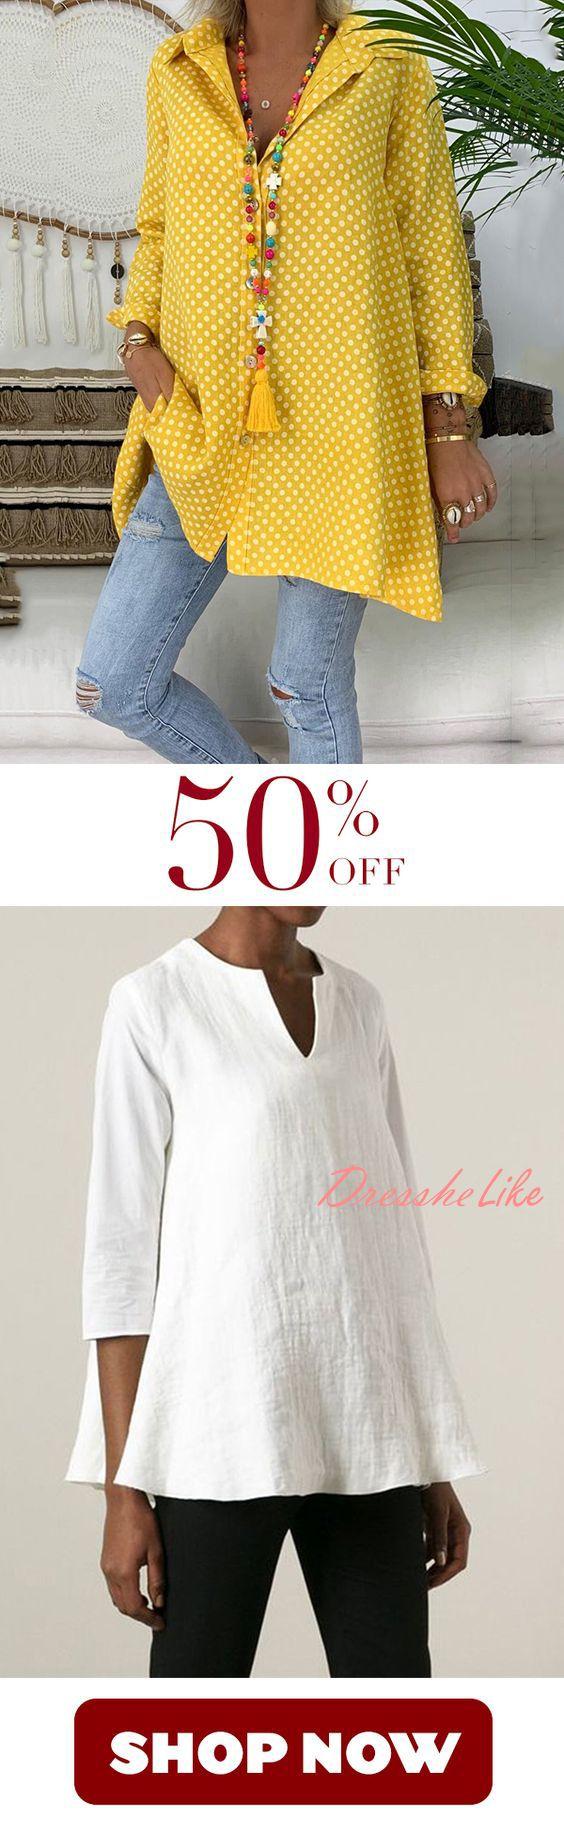 8000+ bought!!! Spring/Summer Polka Dot Cotton Printed Plus Size Shirt